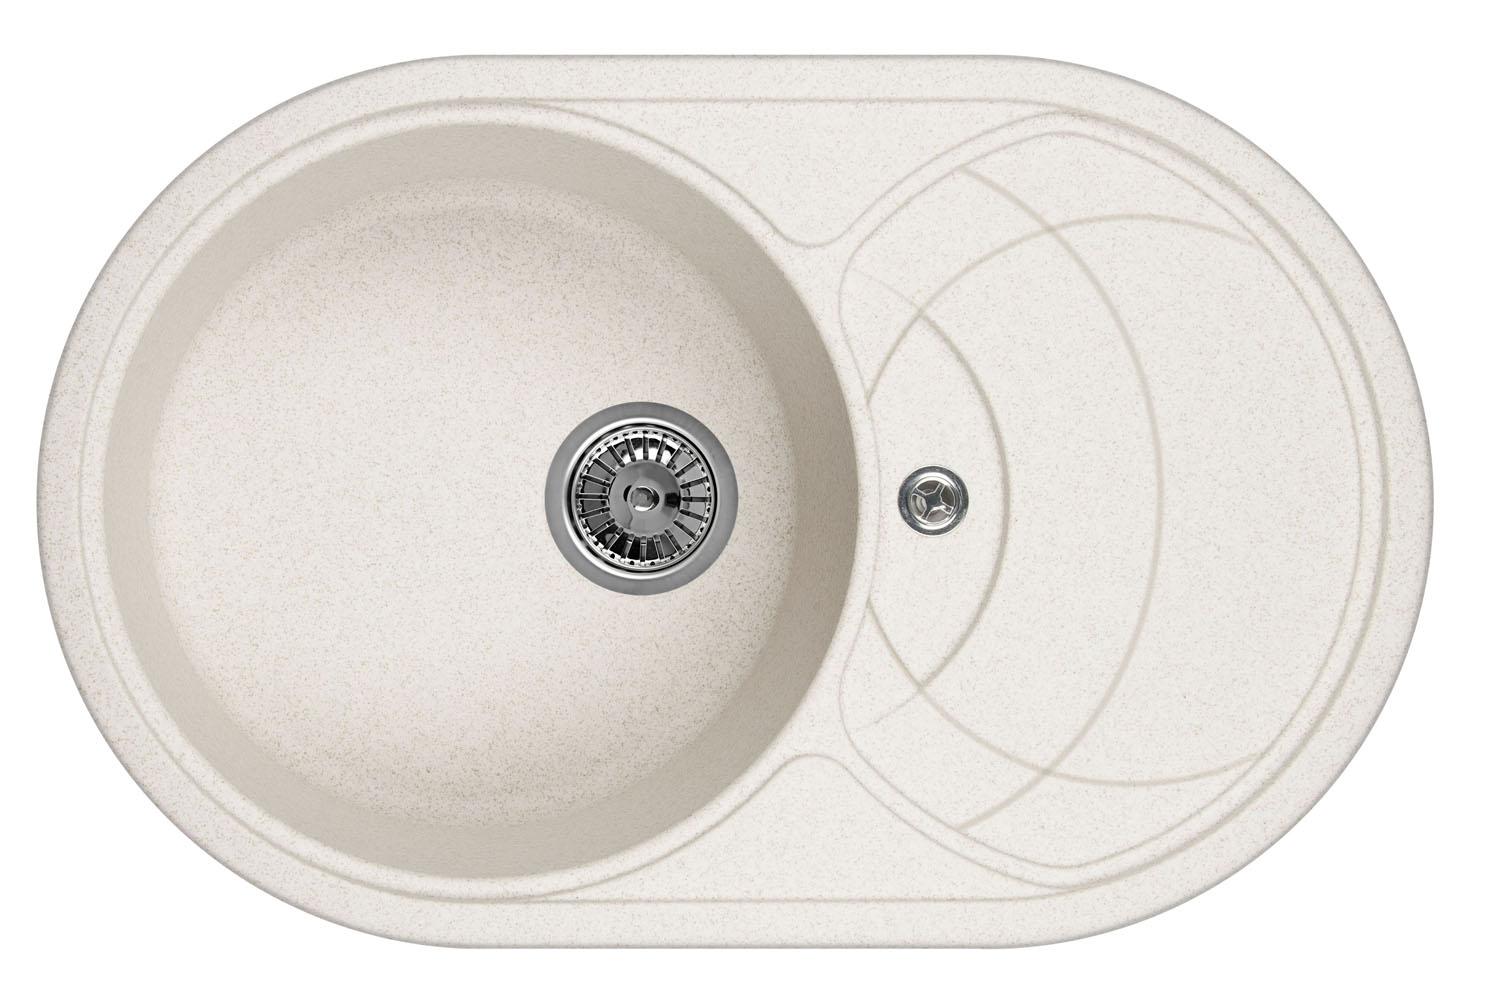 Мойка кухонная Granula Gr-7801 кухонная мойка granula 4201 классик